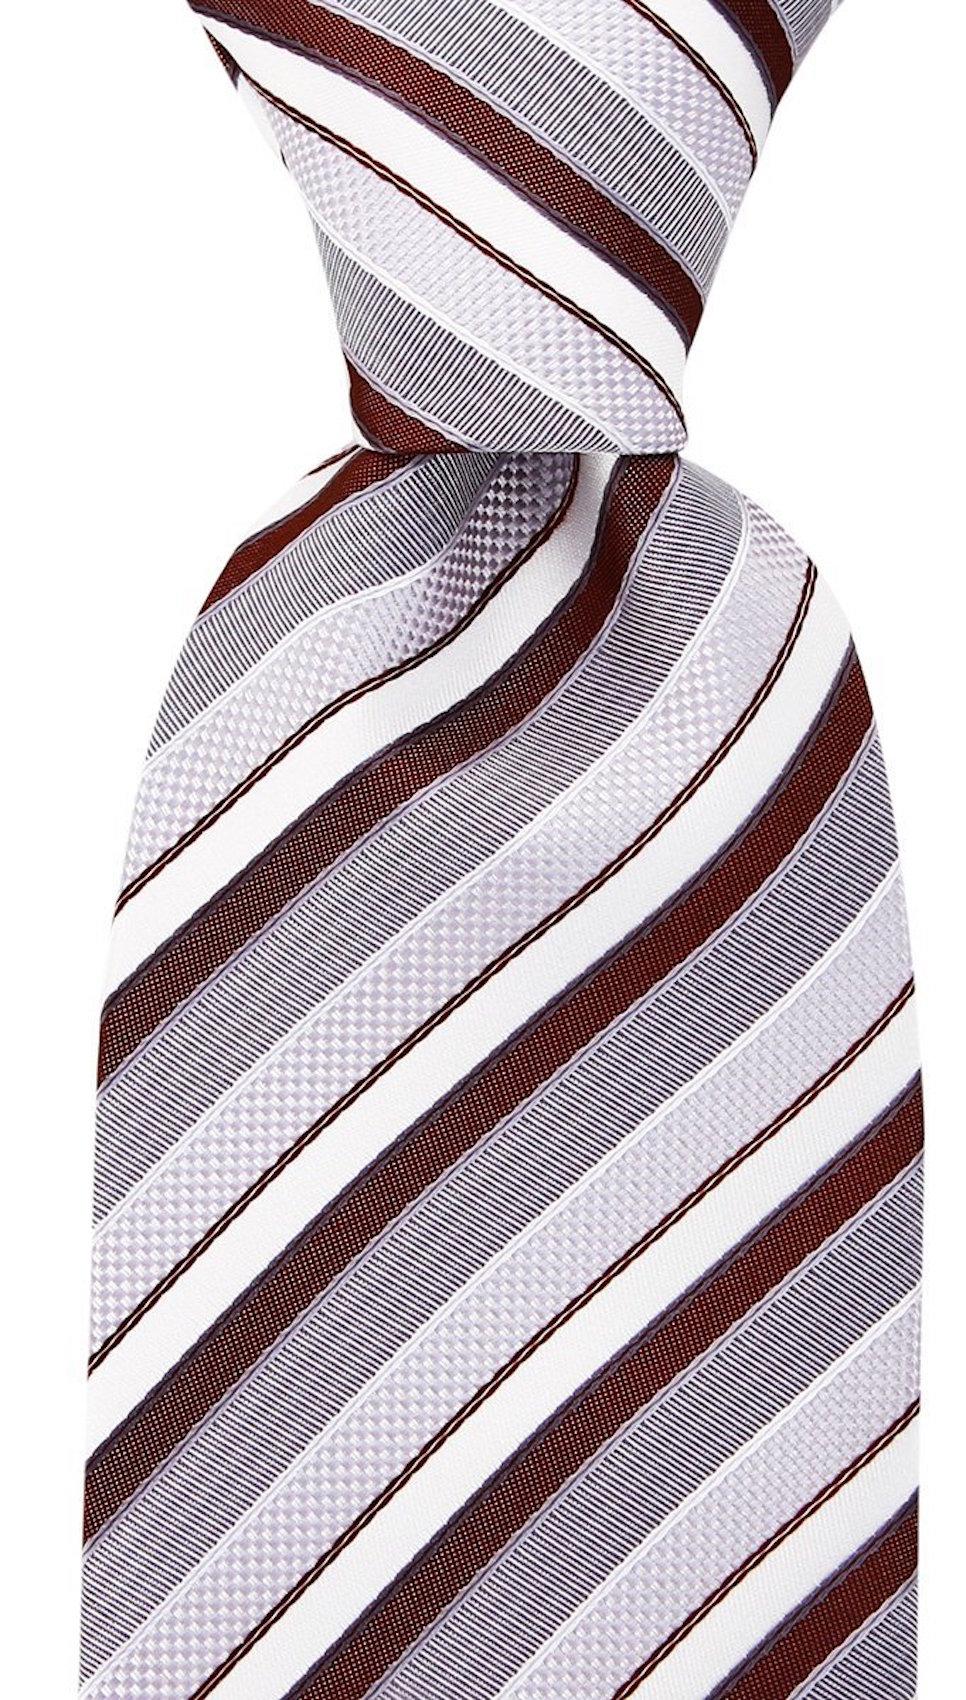 Scott-Allan-Striped-Necktie-Mens-Ties-in-Various-Colors thumbnail 9